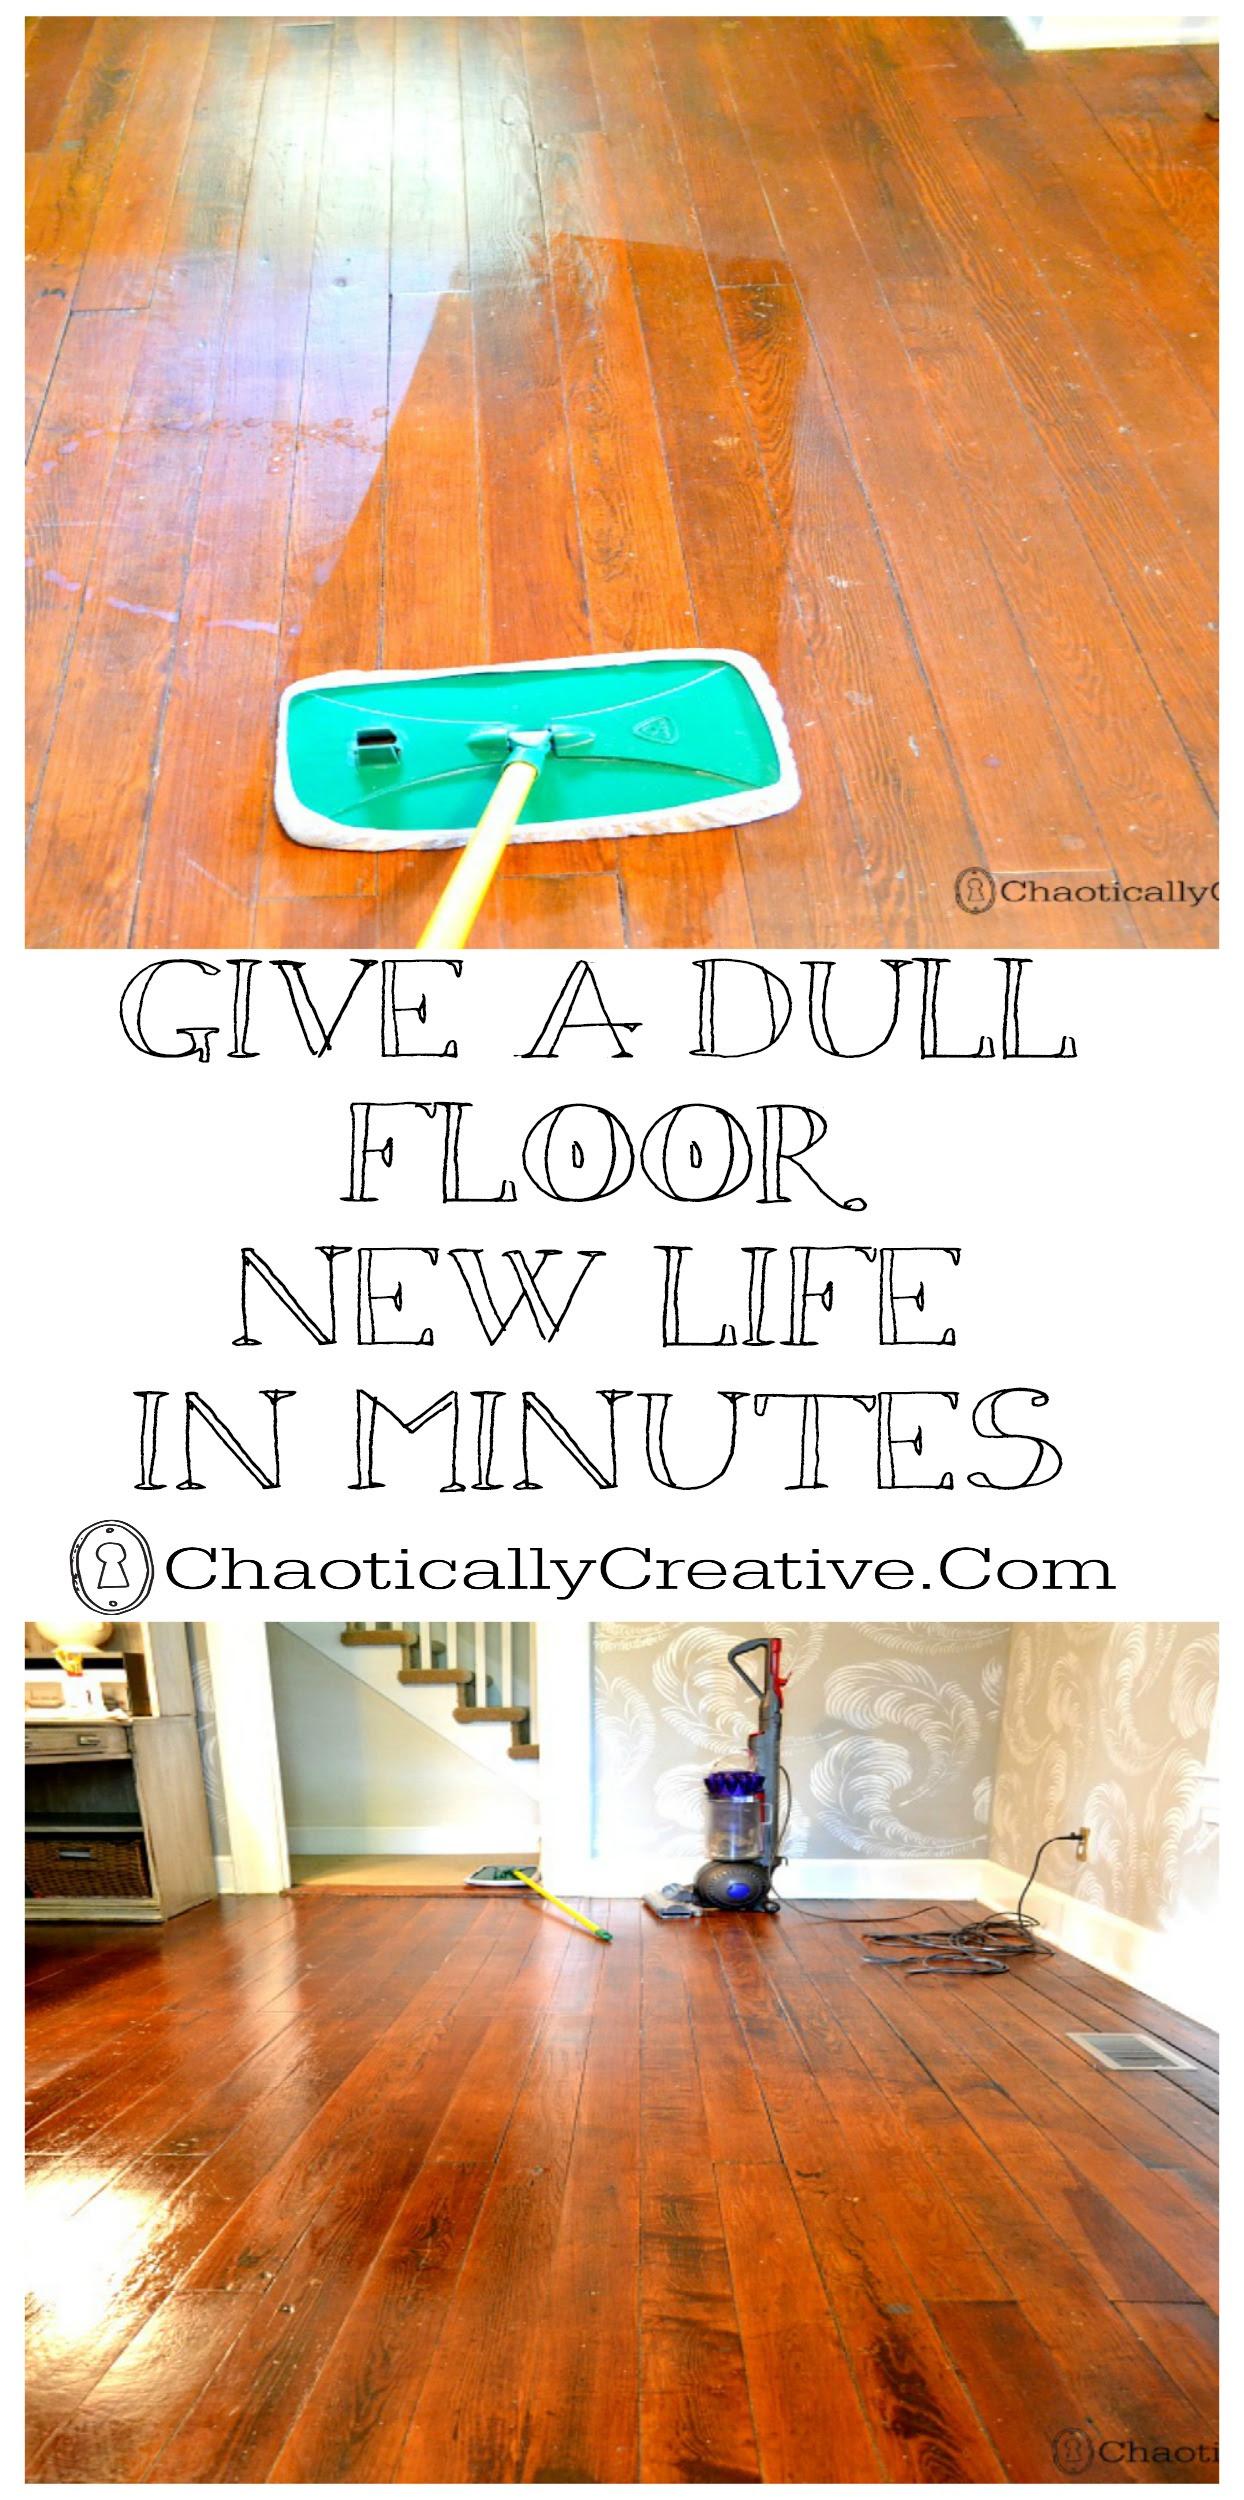 Dull floor new life in seconds